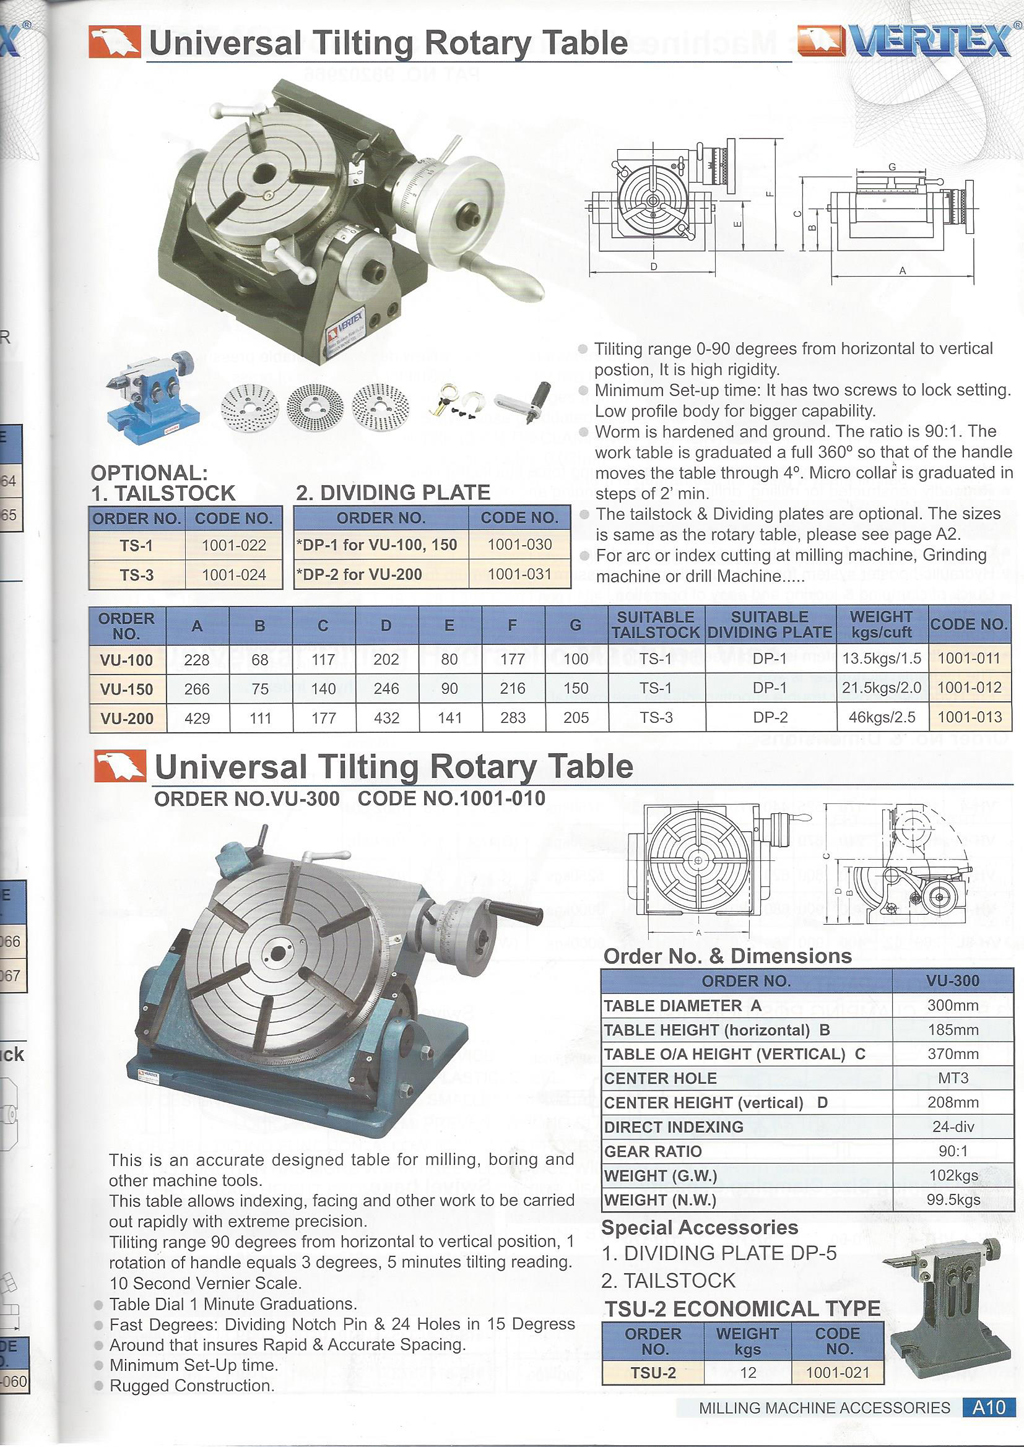 vertex rotary table user manual